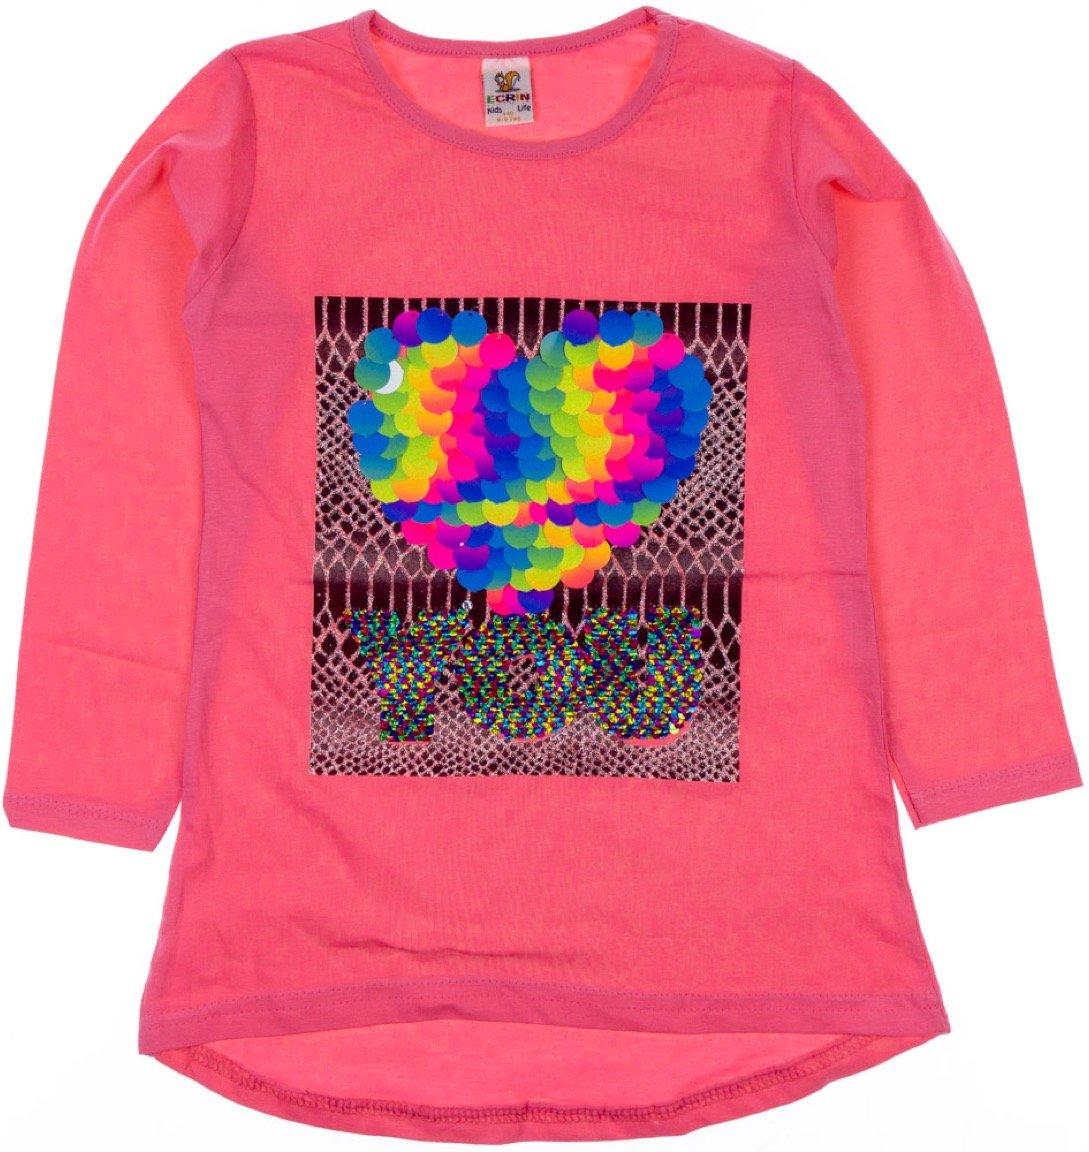 Ecrin παιδική εποχιακή μπλούζα «You»